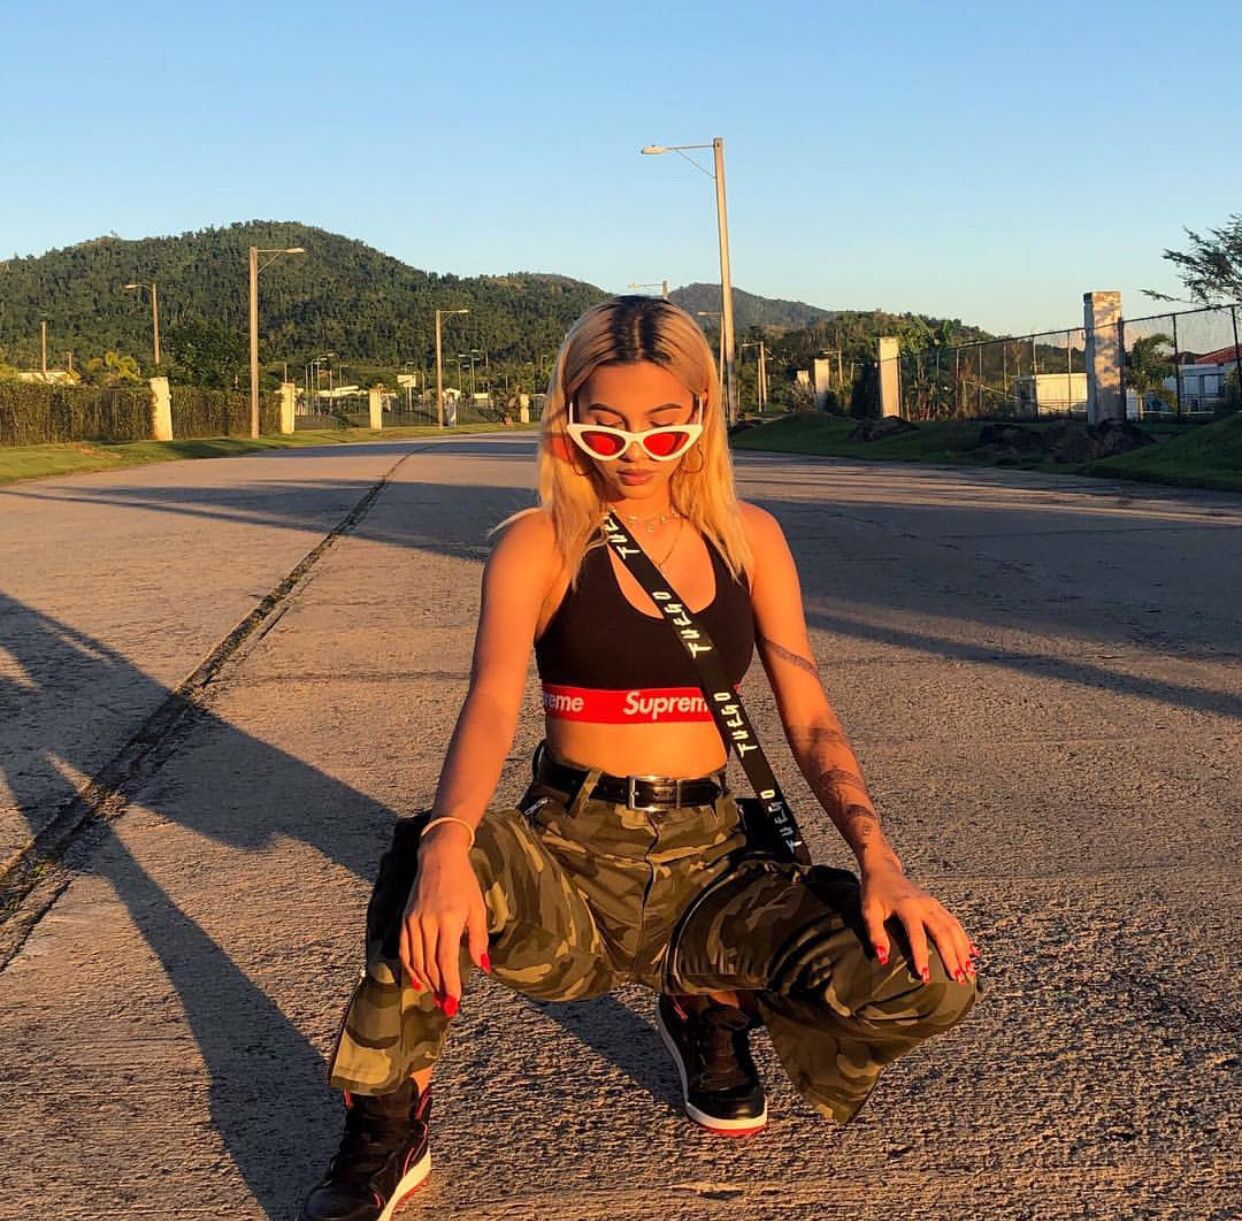 biker shorts all summer long☀️ @fashionnova